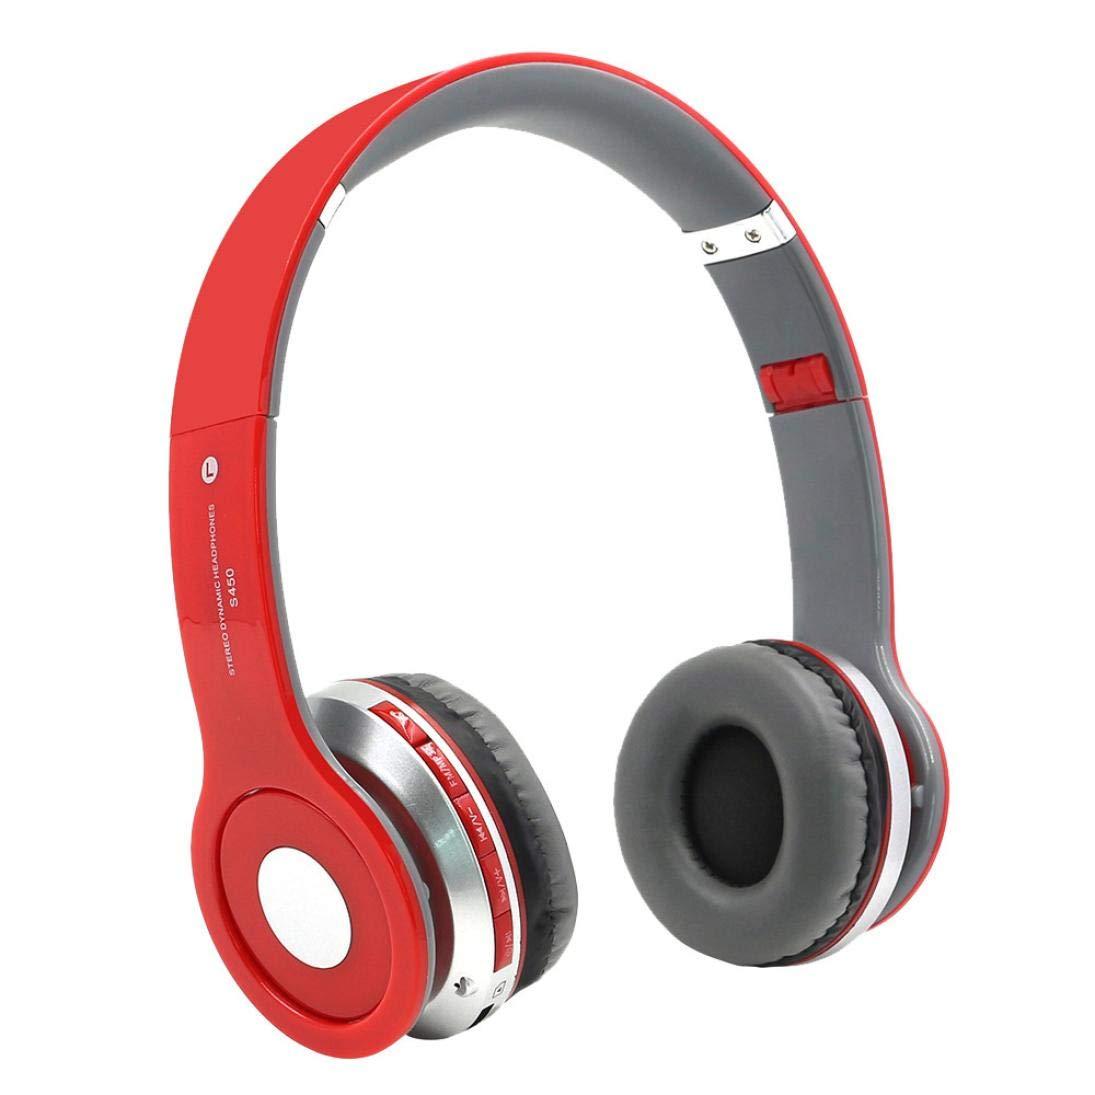 AmaSells Wireless Headphones